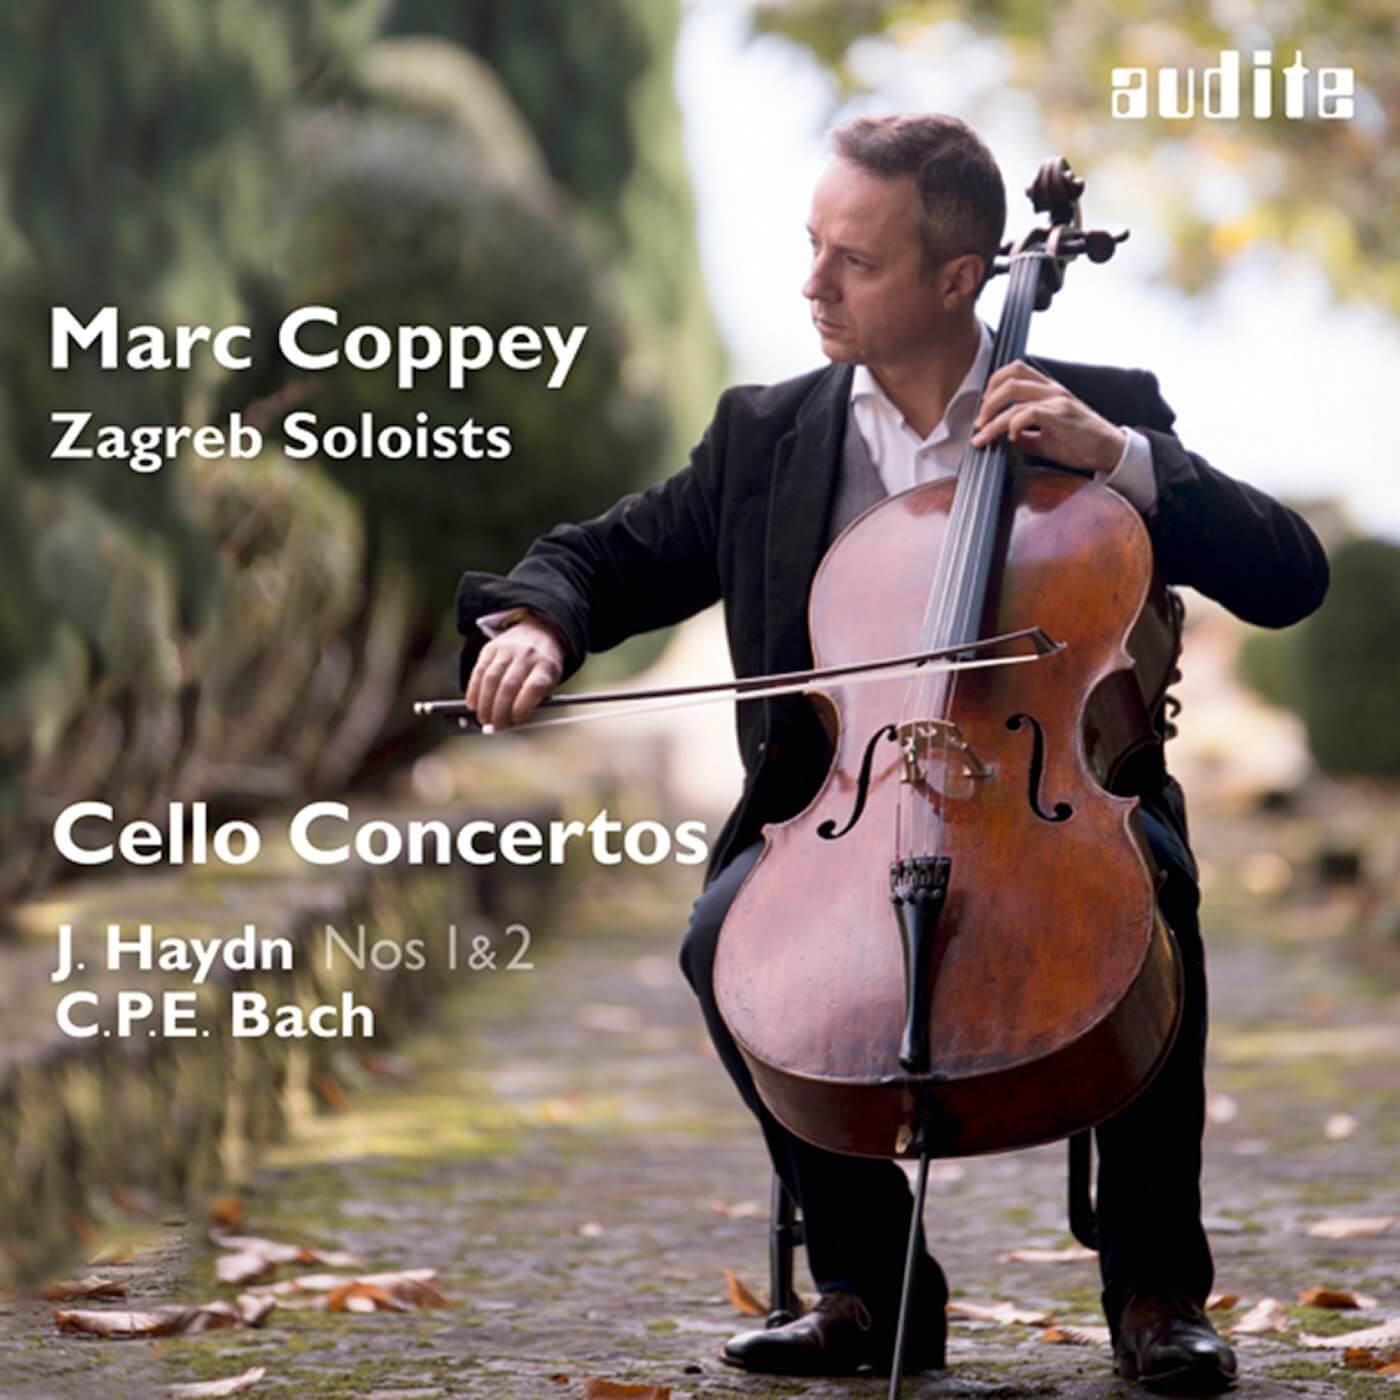 Zagrebacki solisti Recenti Marc Coppey